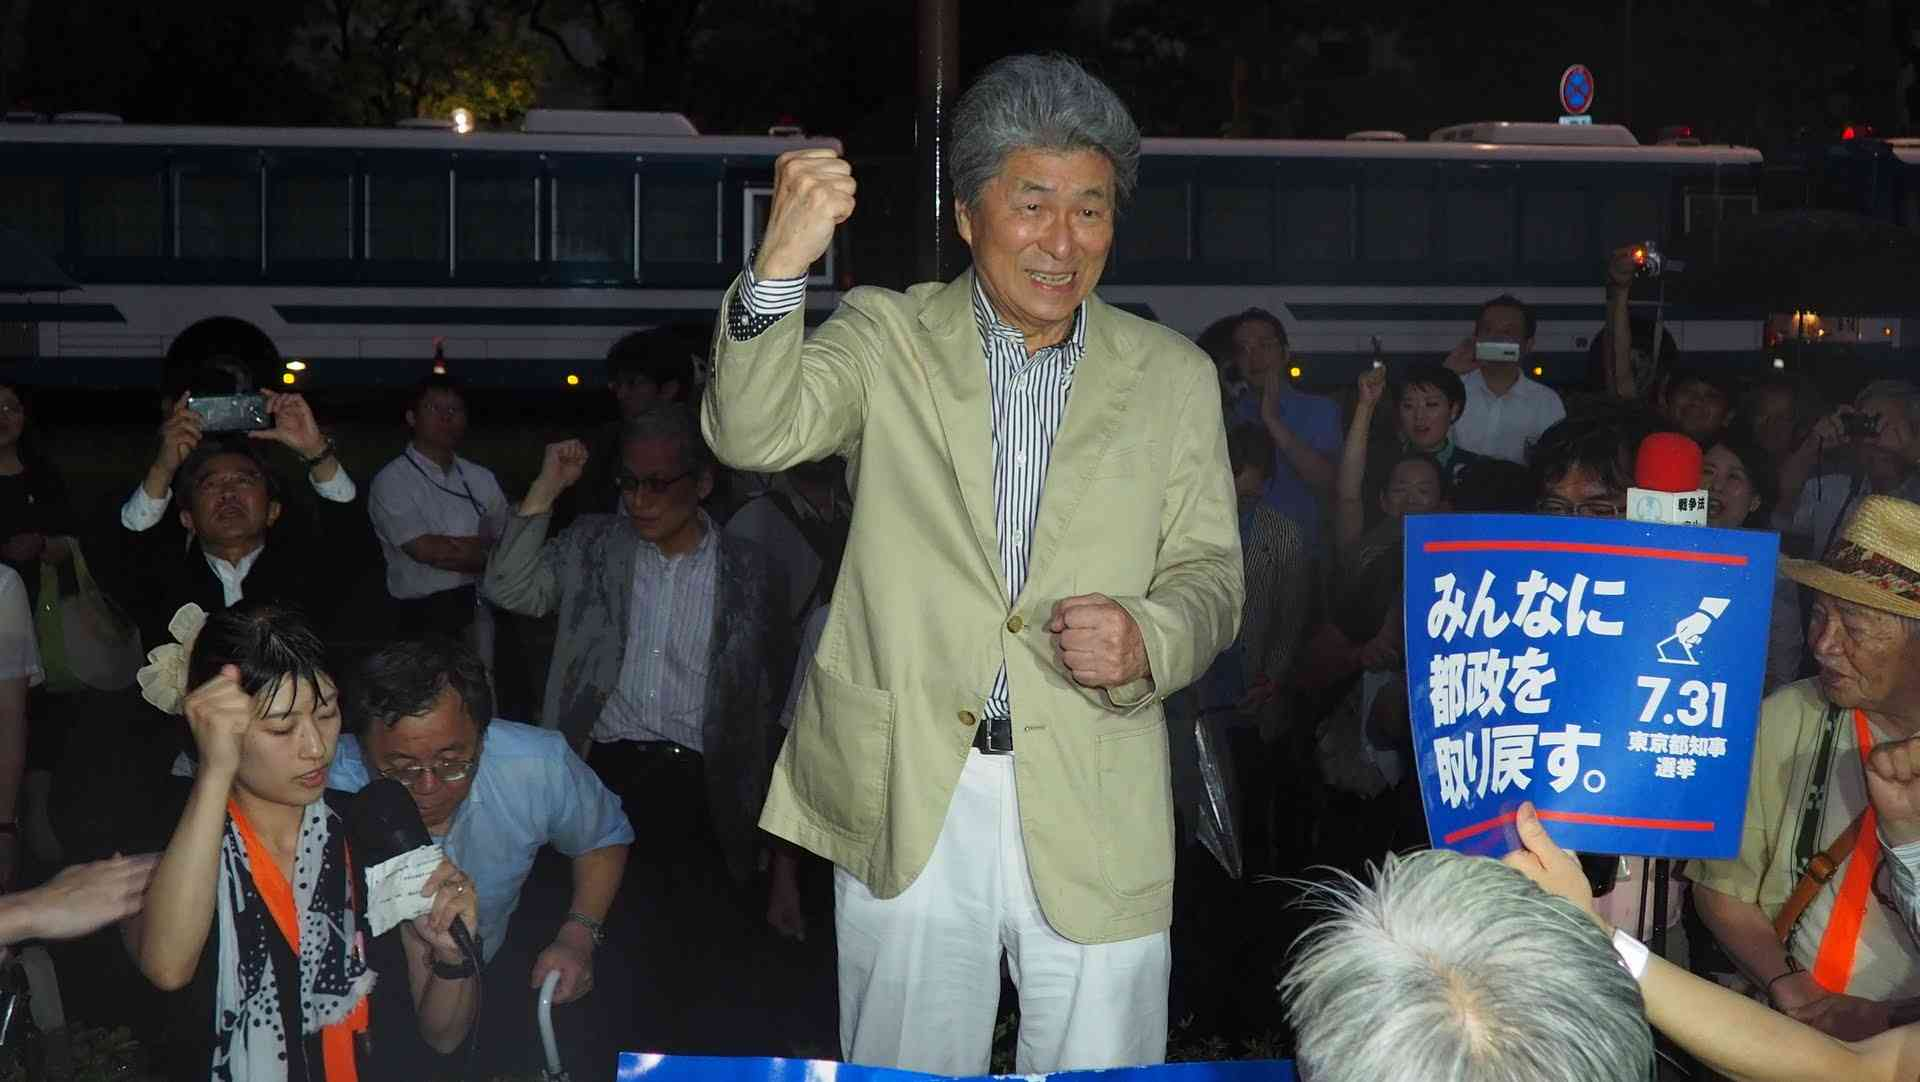 鳥越俊太郎 東京都知事選挙 候補 2016年7月19日 戦争法廃止、憲法改悪は許さない、7・19国会議員会館前集会 - YouTube